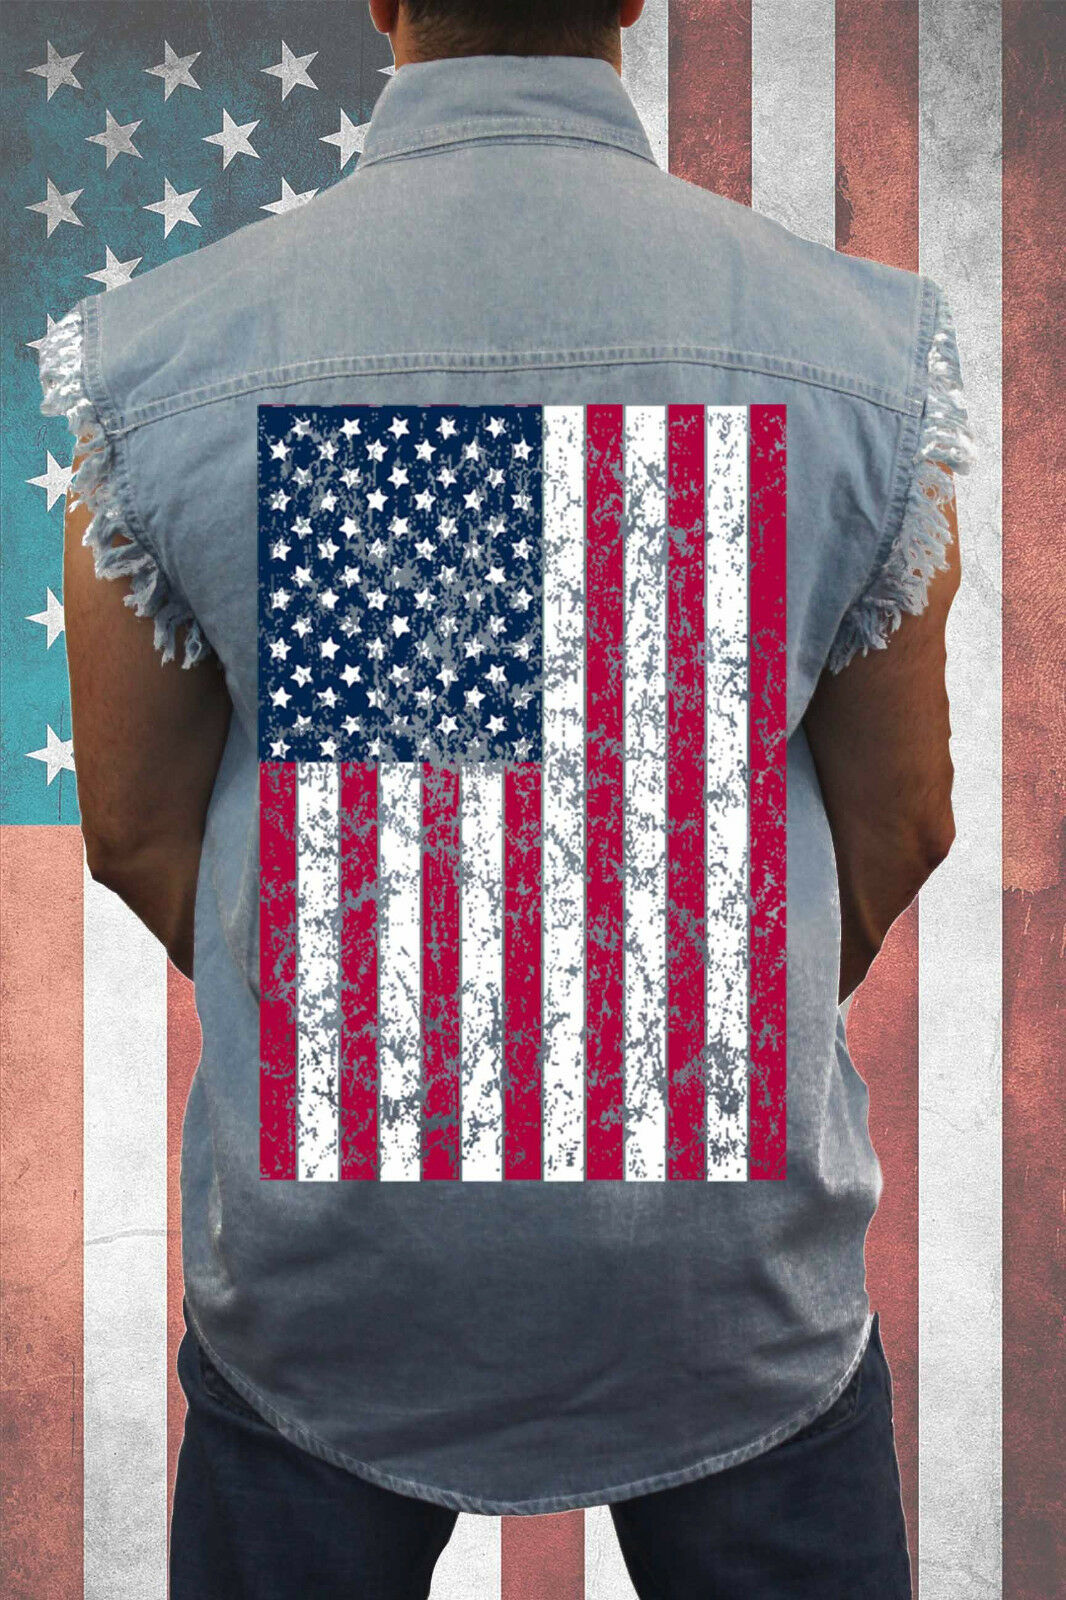 MEN'S LIGHT DENIM SLEEVELESS SHIRT American Patriot USA FLAG STARS STRIPES M-6X